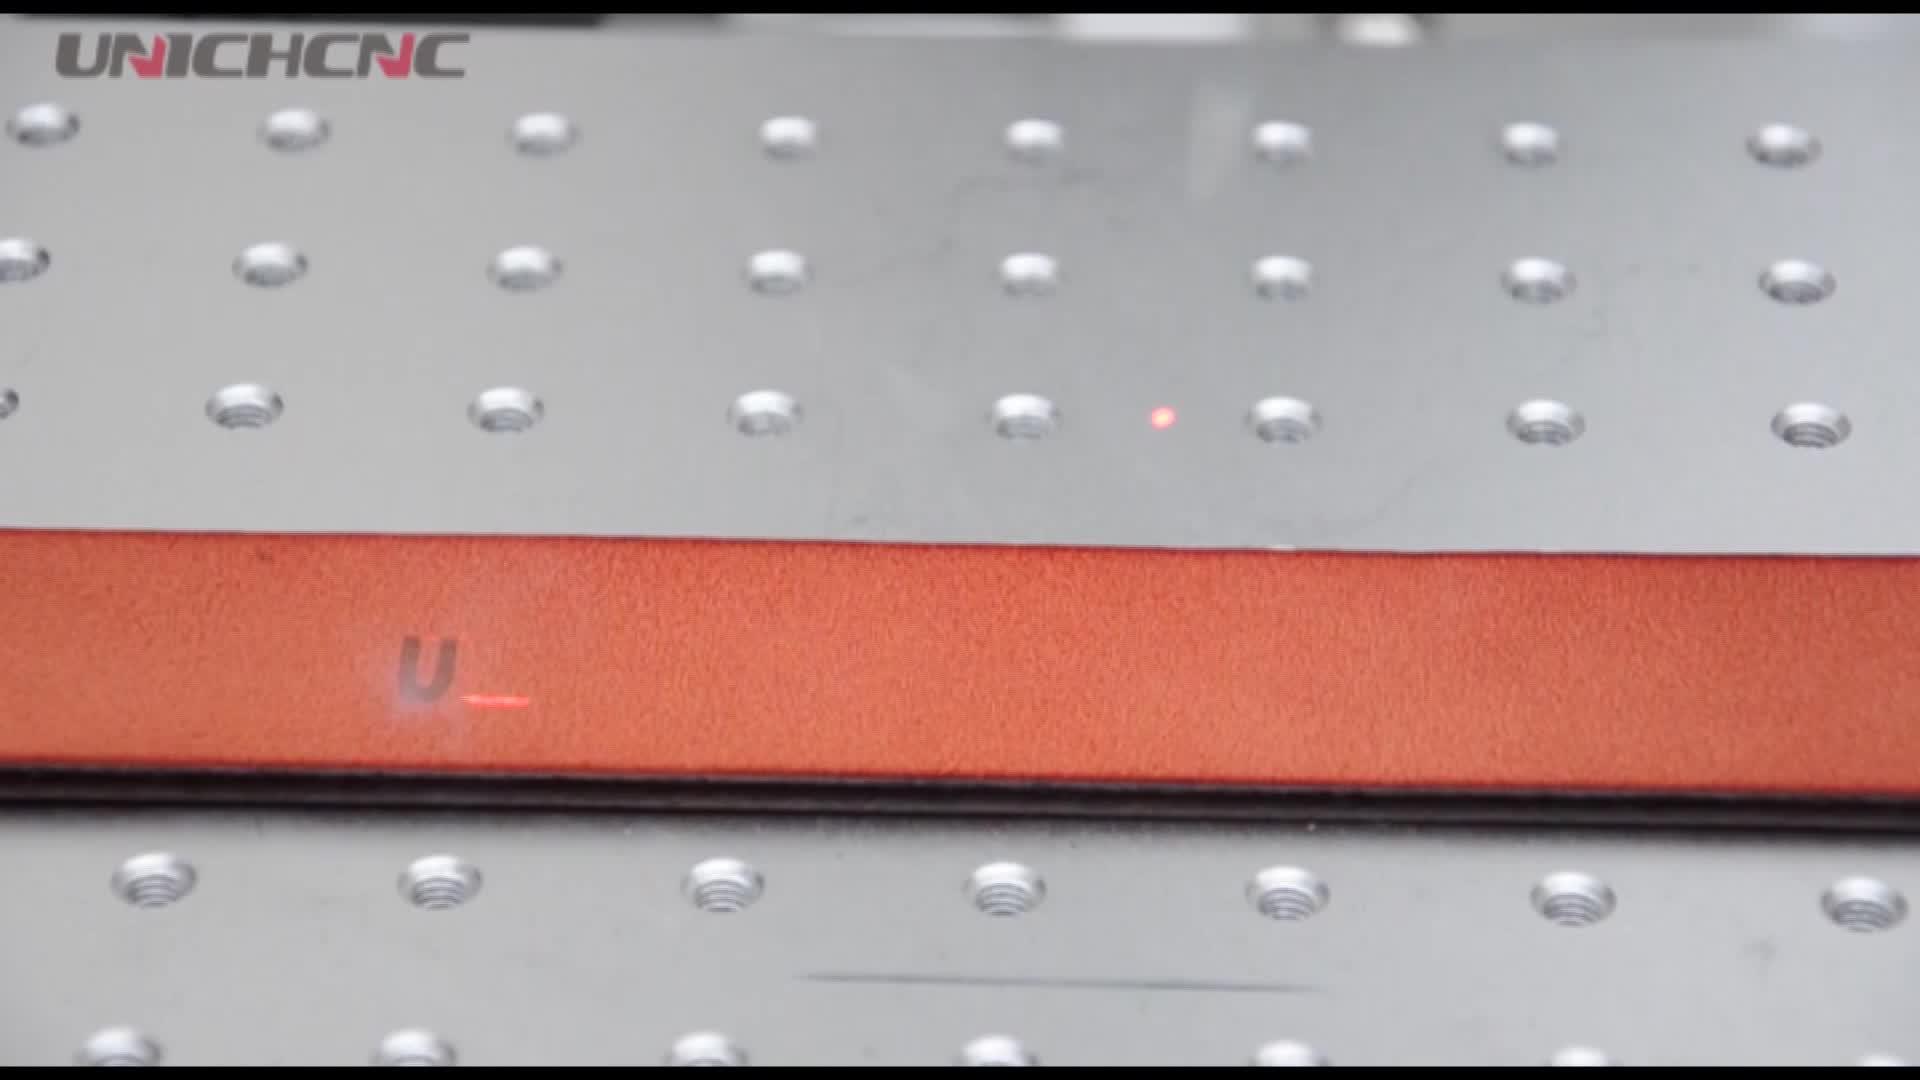 Split laser printer laser marking machine static with ipg or raycus mopa